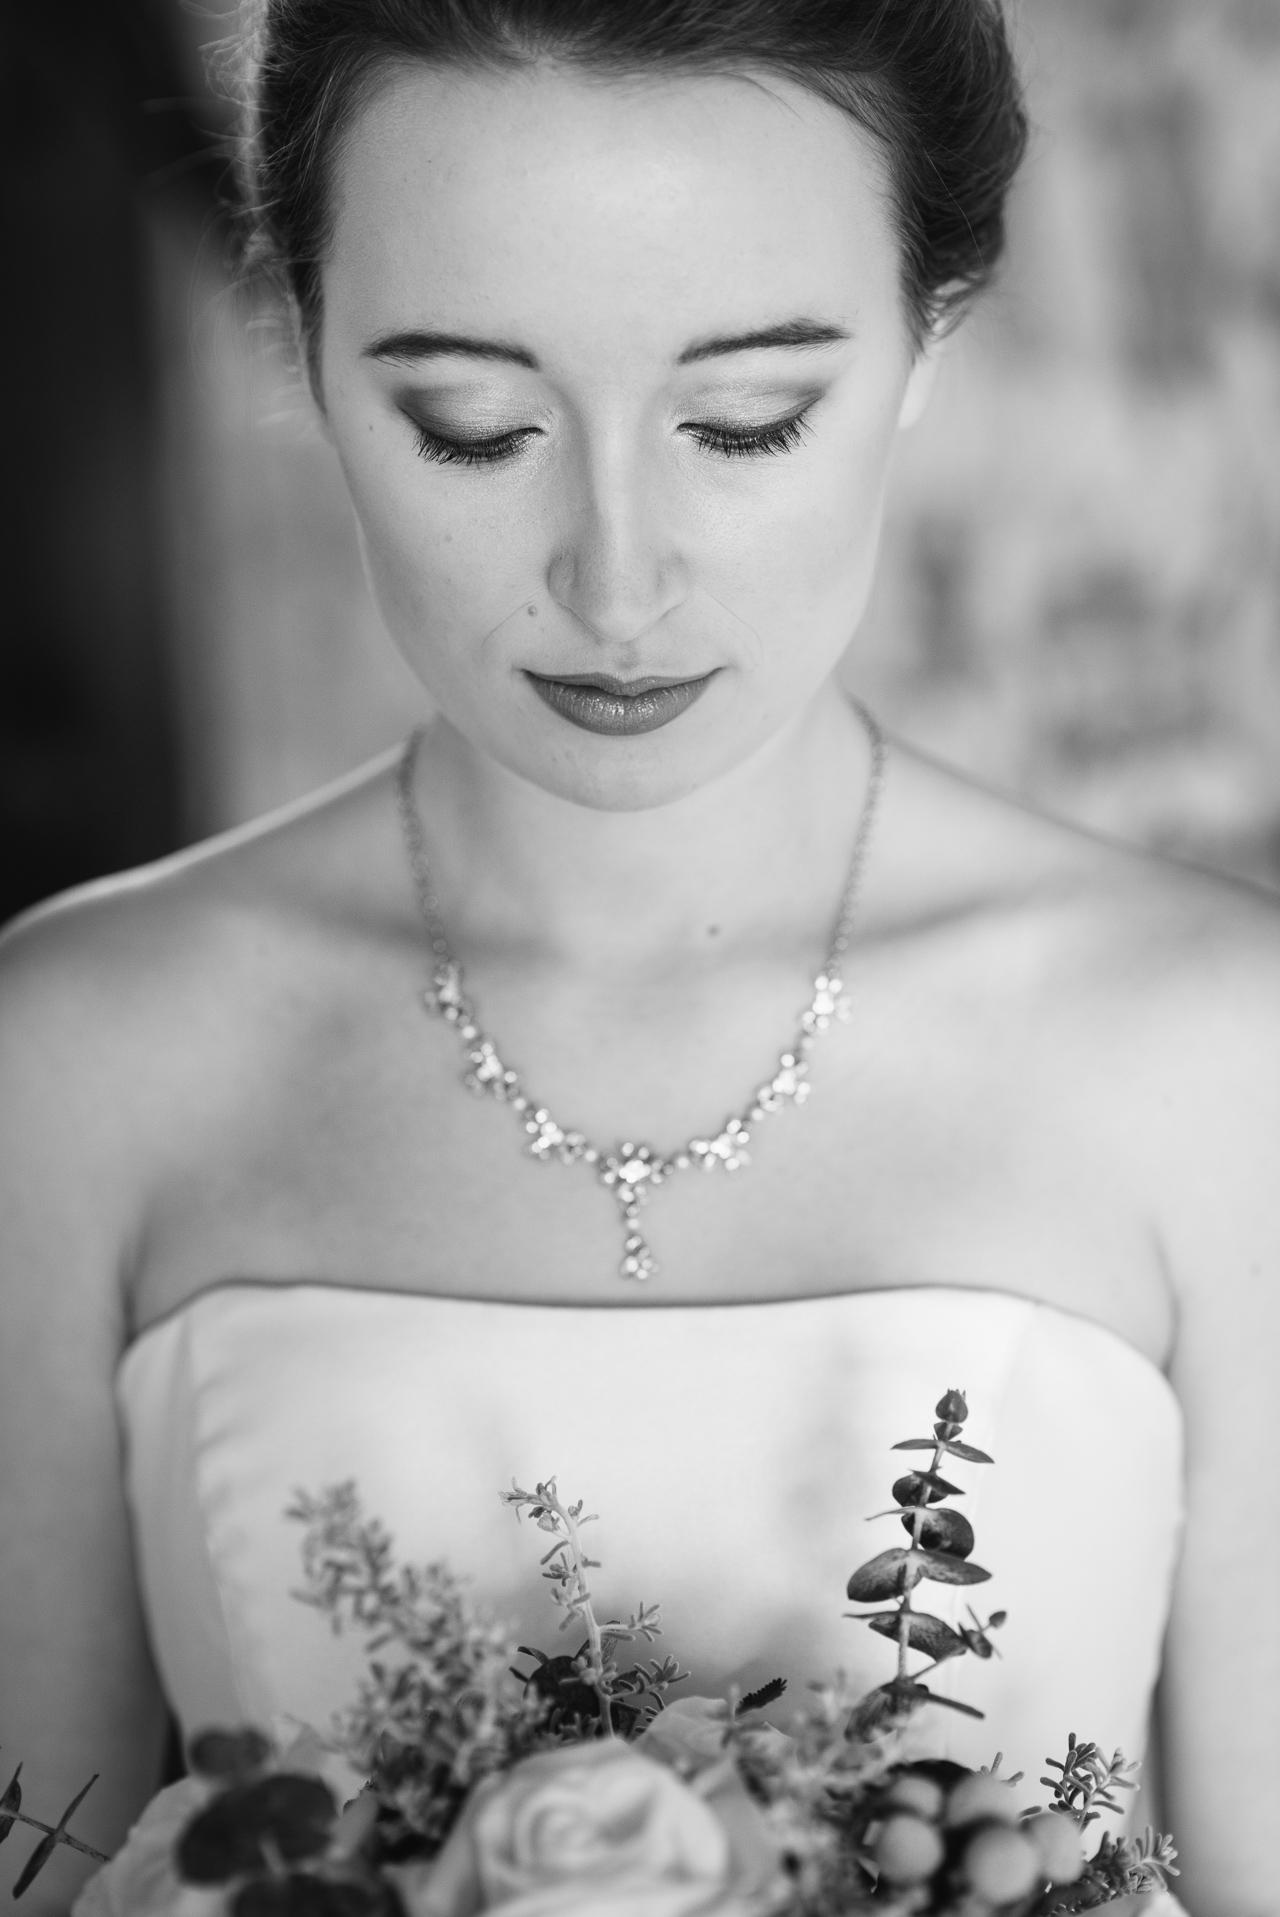 Swallows Oast Winter Bride Photo Shoot | Oakhouse Photography